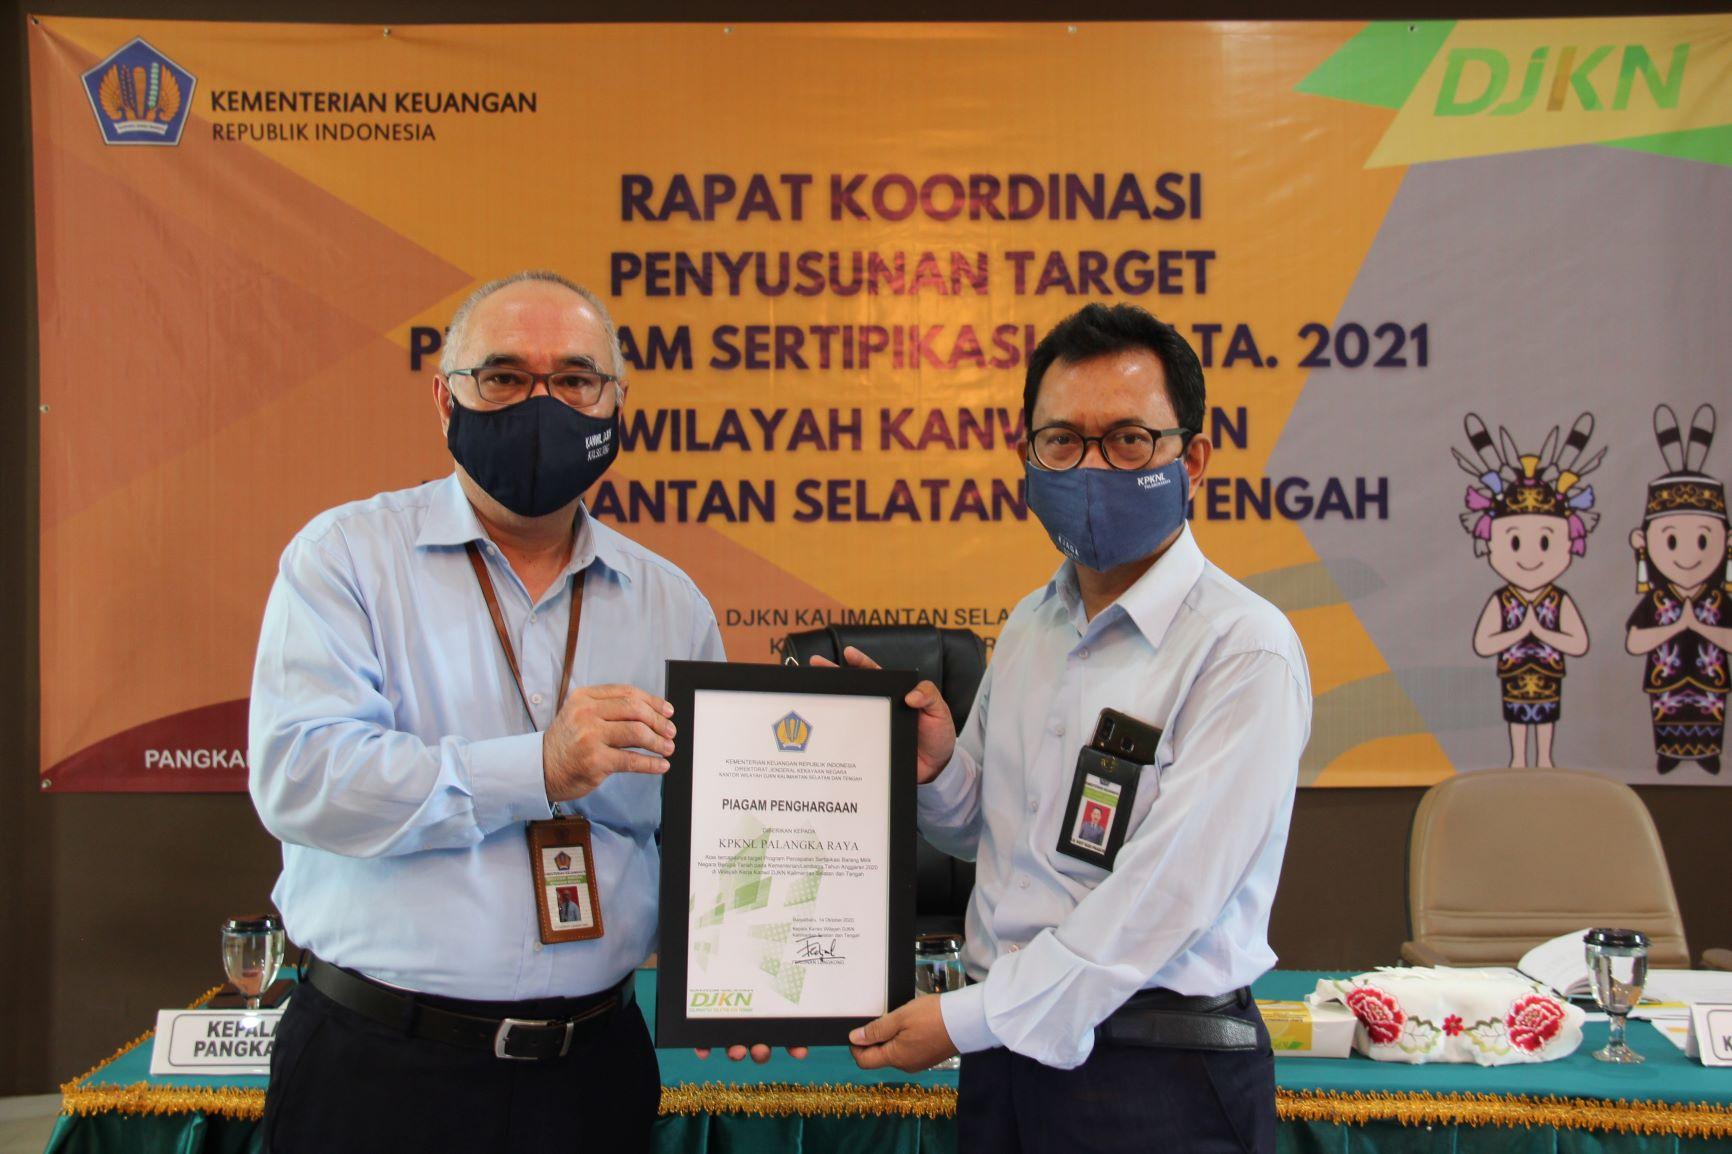 Rapat Pembahasan Target Sertipikasi BMN berupa Tanah Tahun 2021